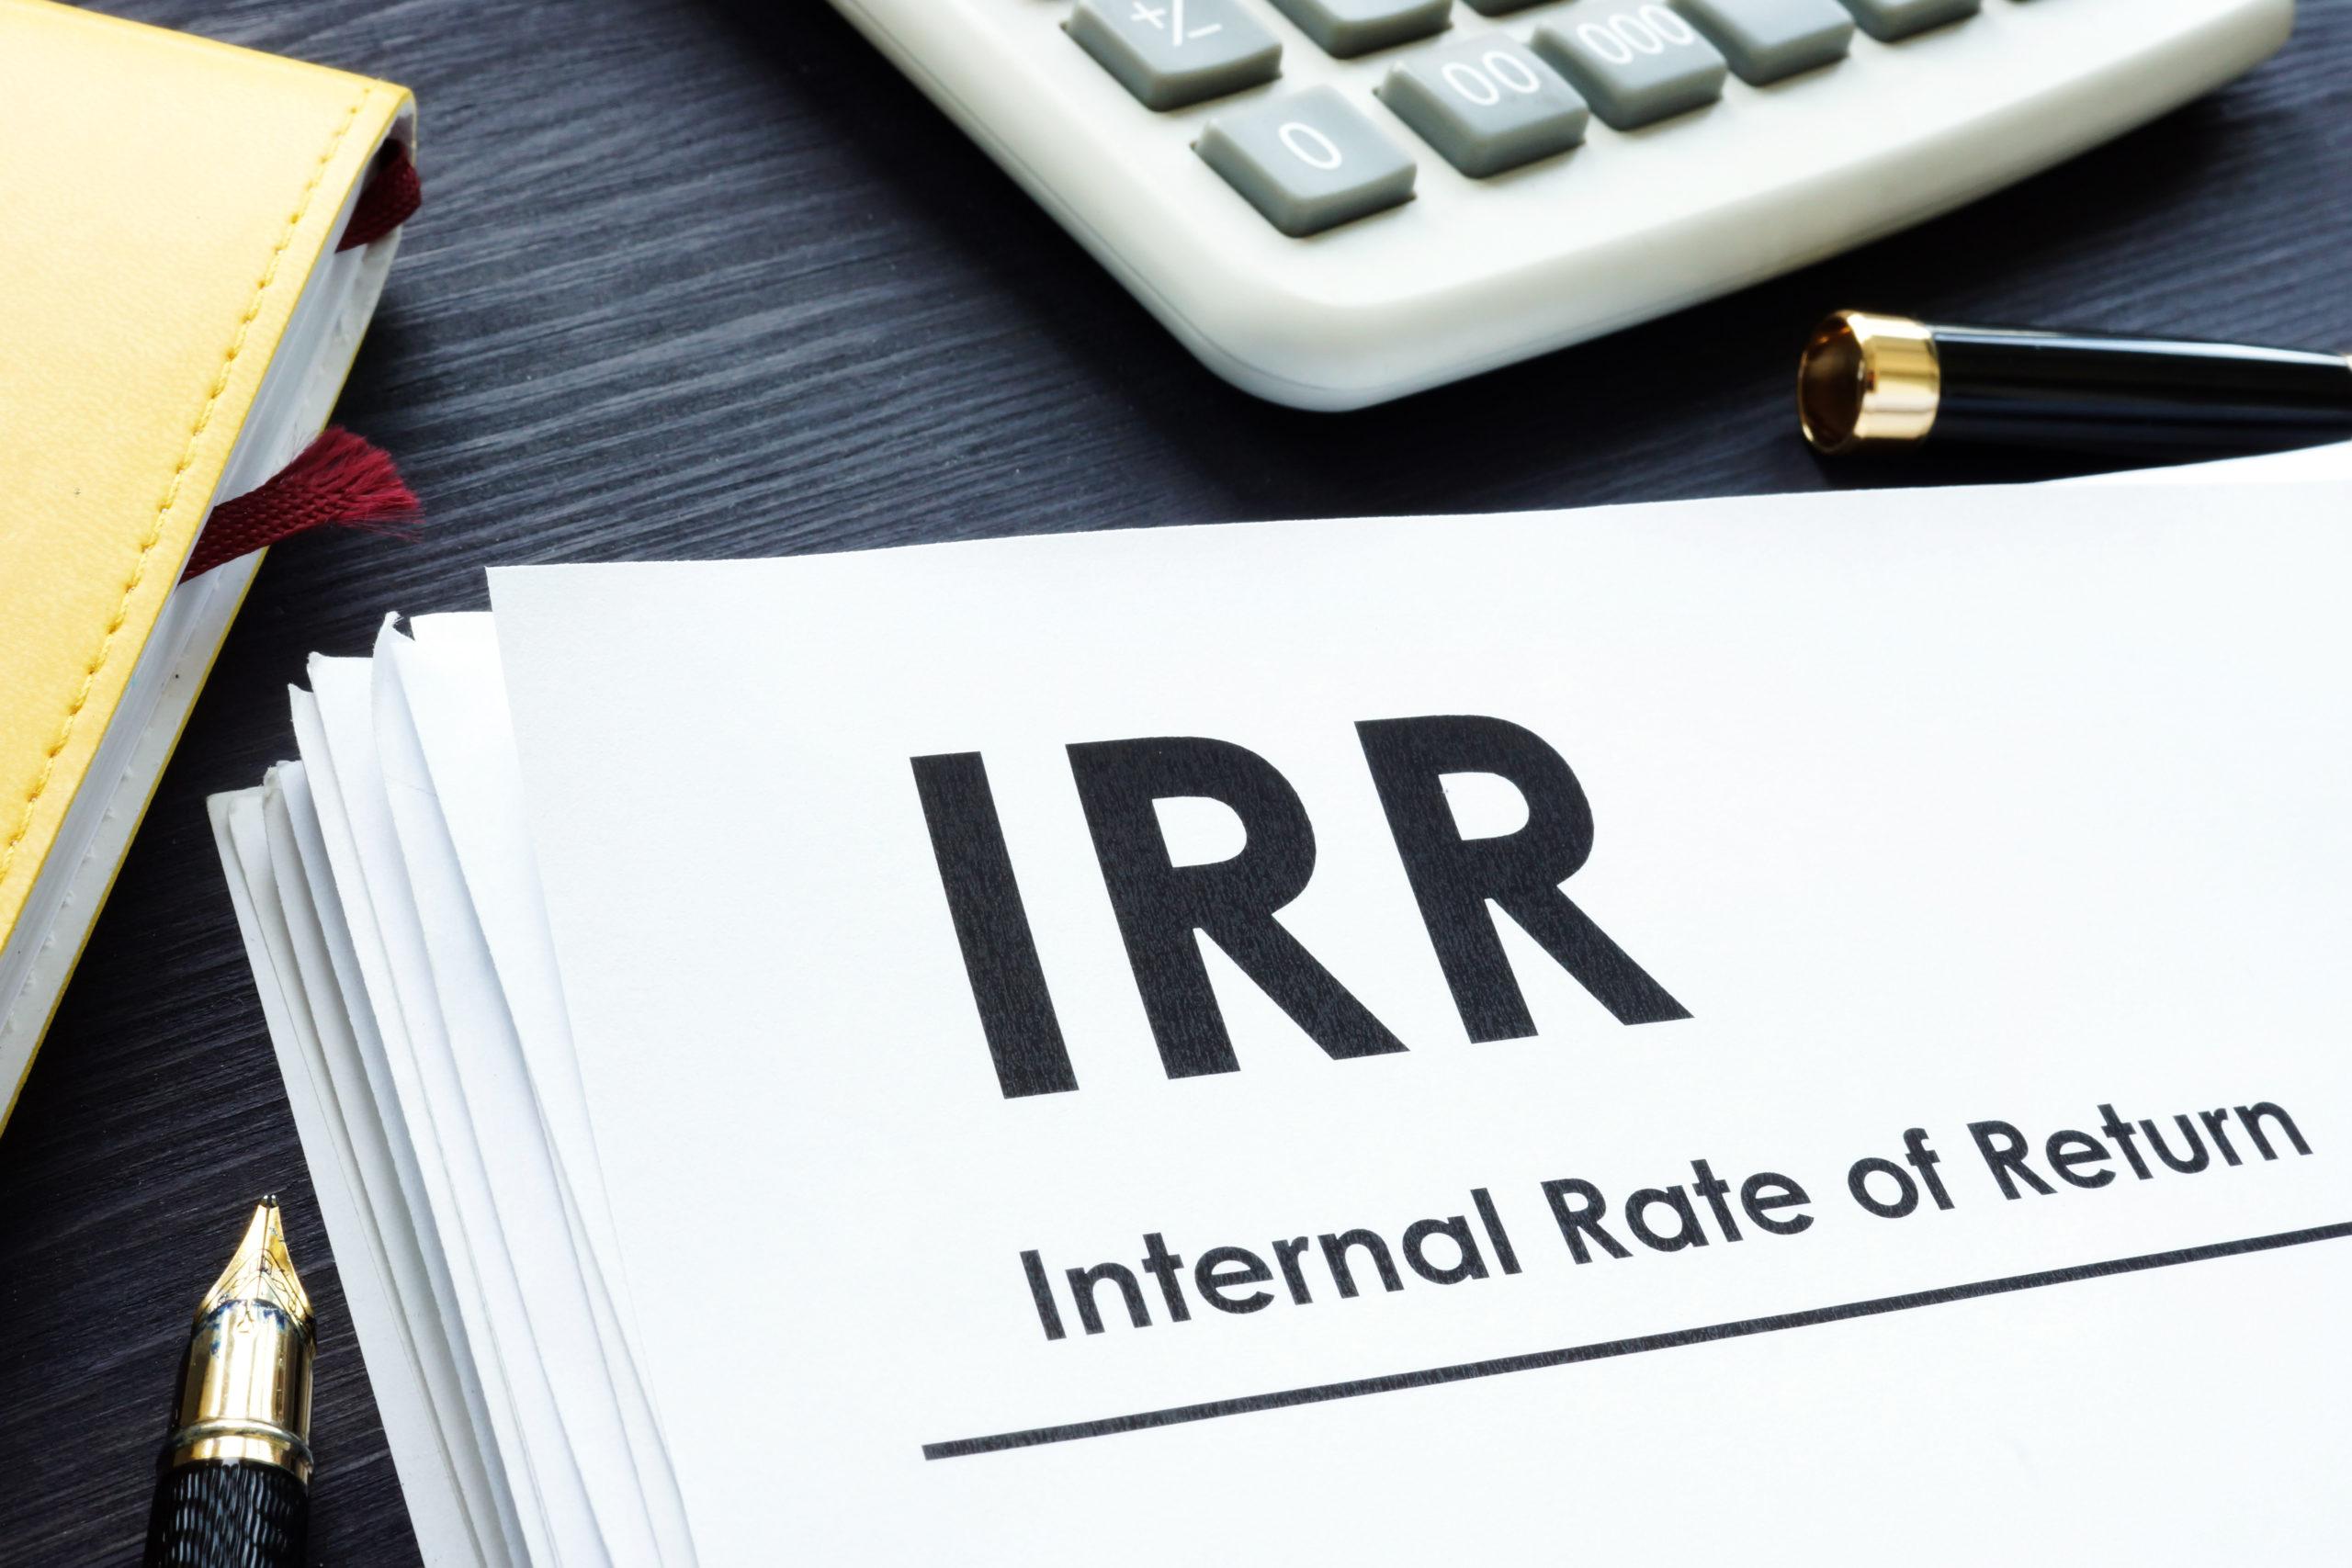 irr vs internal rate of return